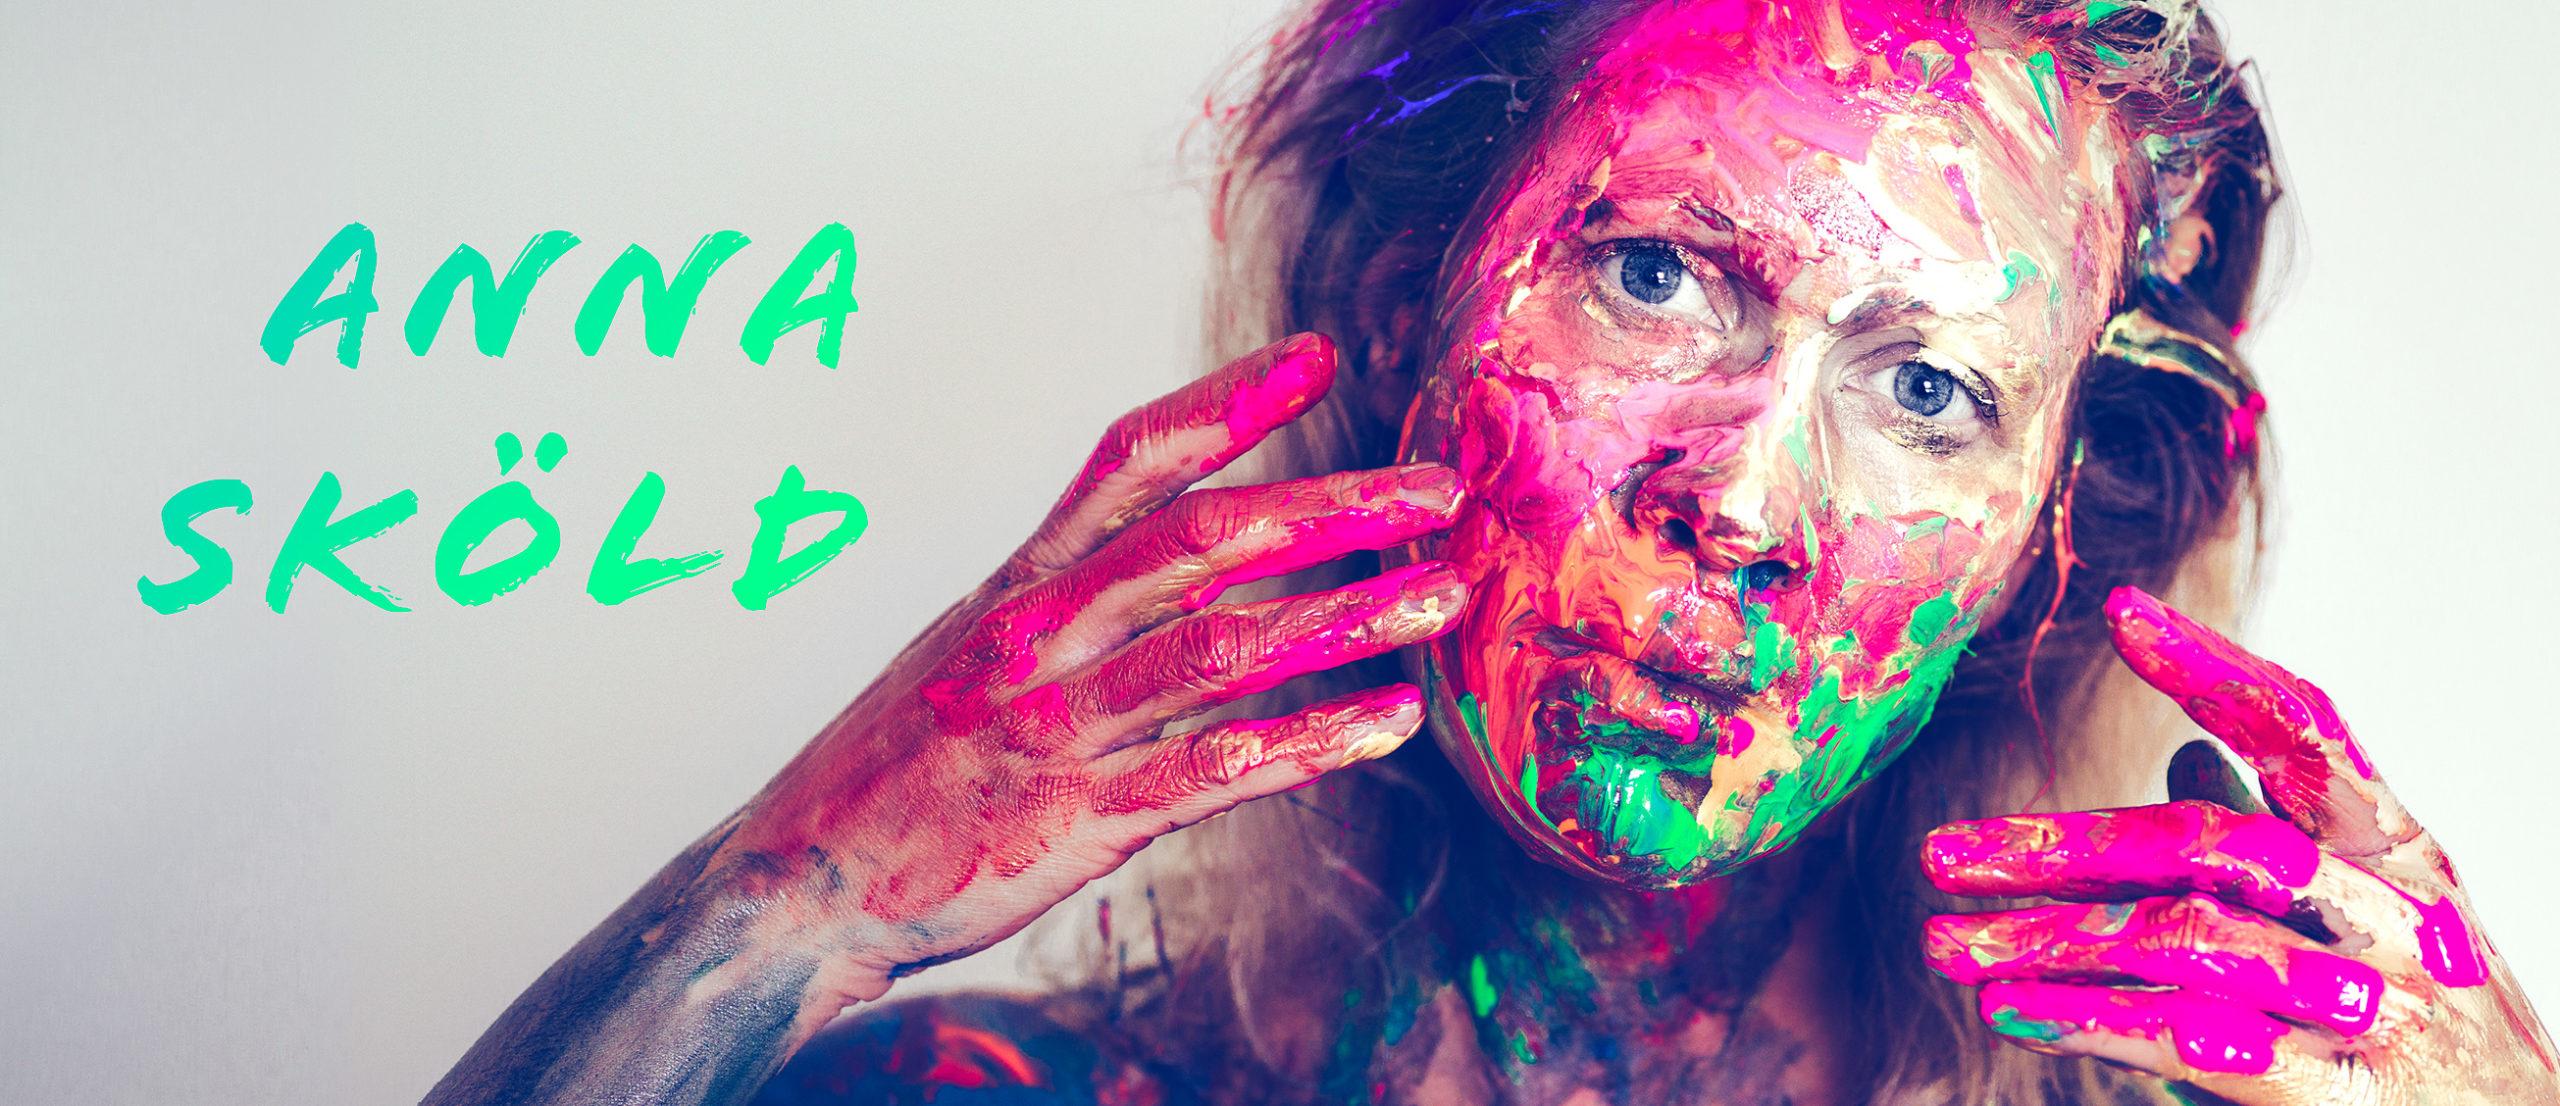 Anna Sköld in camouflage makeup